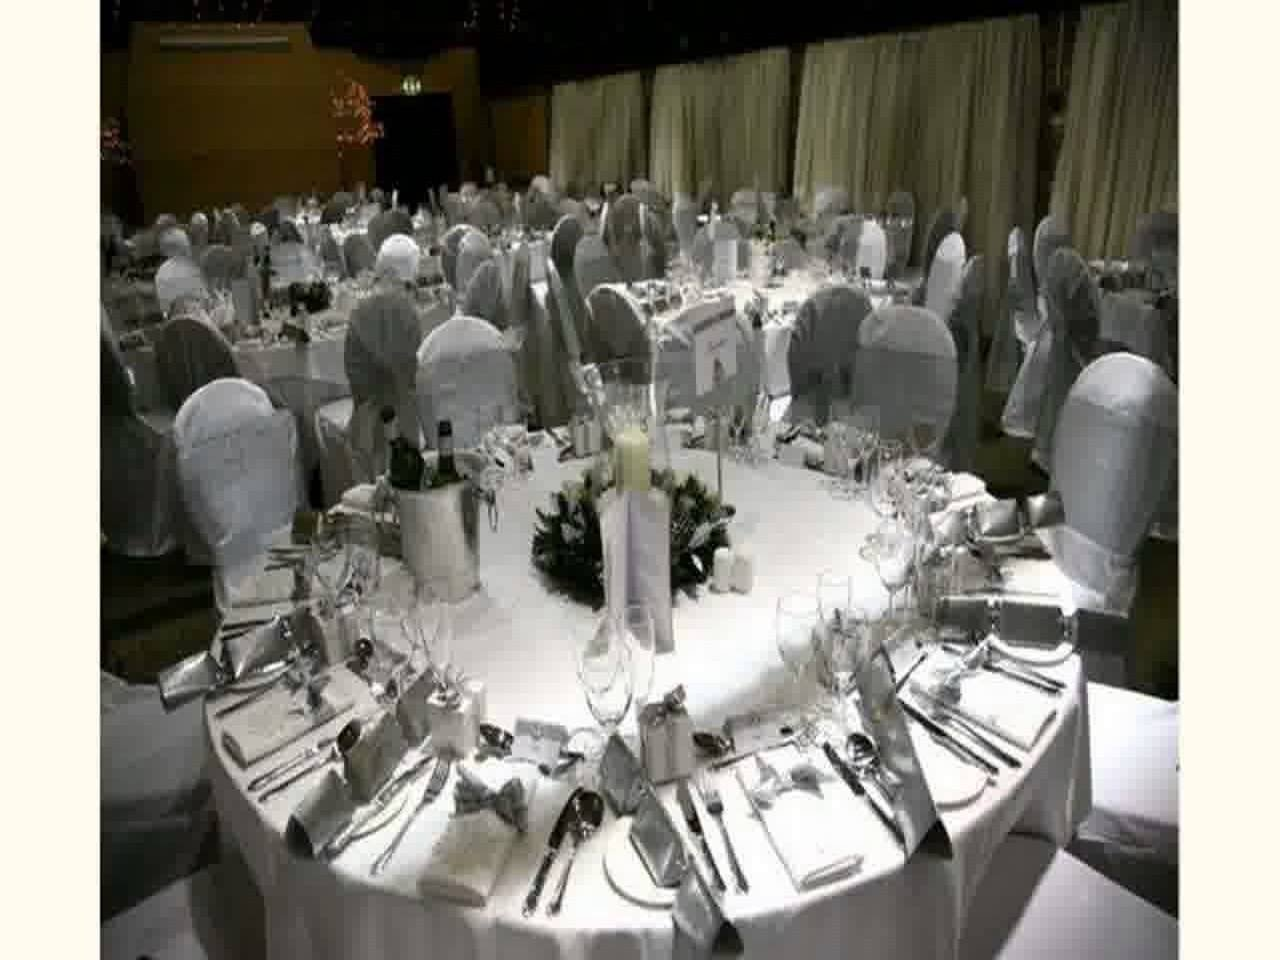 10 Trendy Wedding Reception Table Decorations Ideas new wedding cake table decoration ideas youtube 1 2020